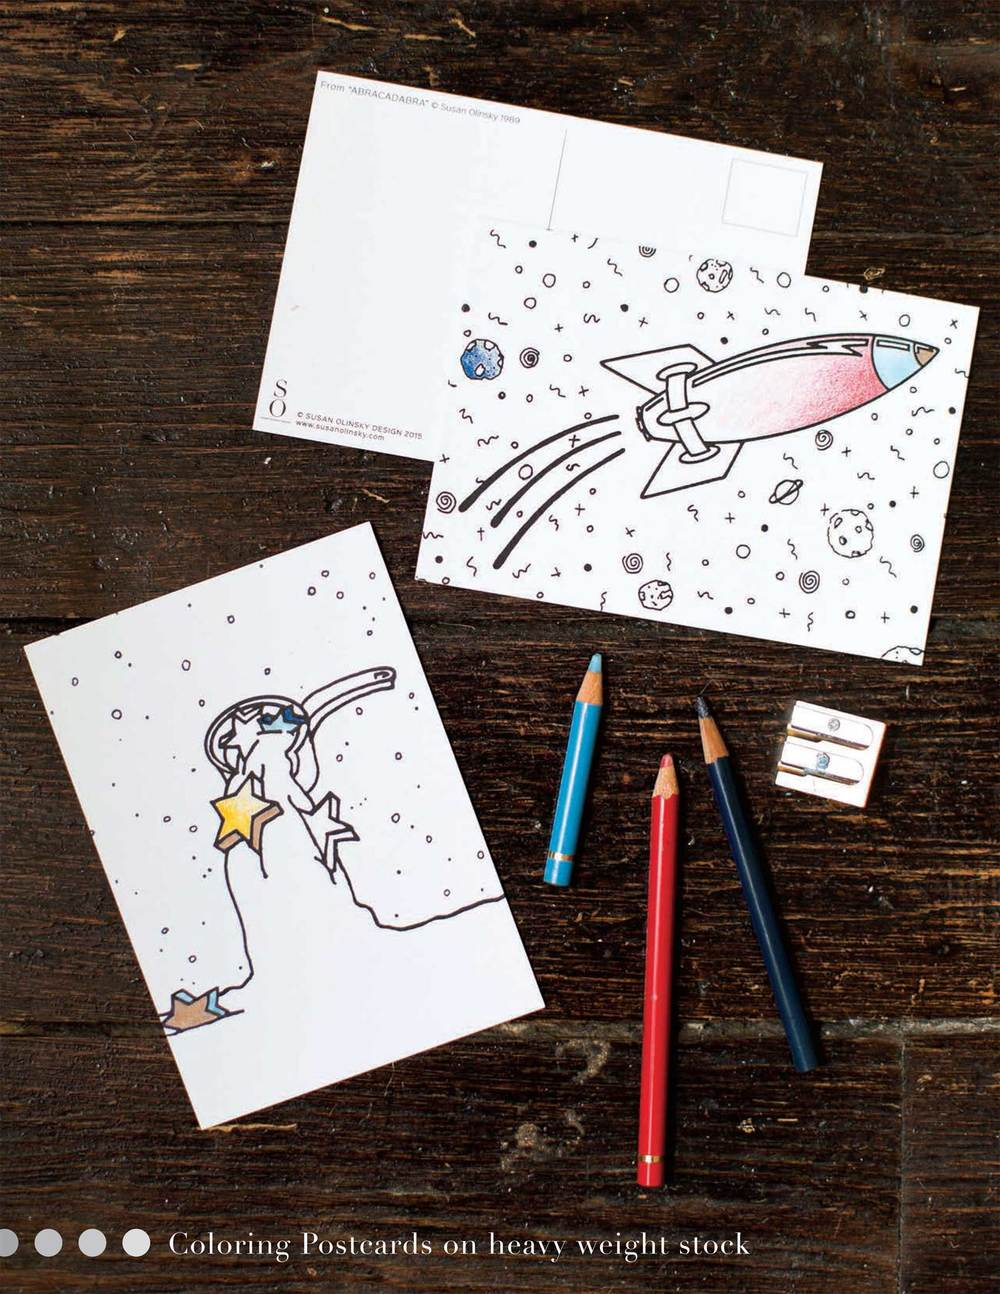 coloring_postcards.sample_2015.opt.jpg